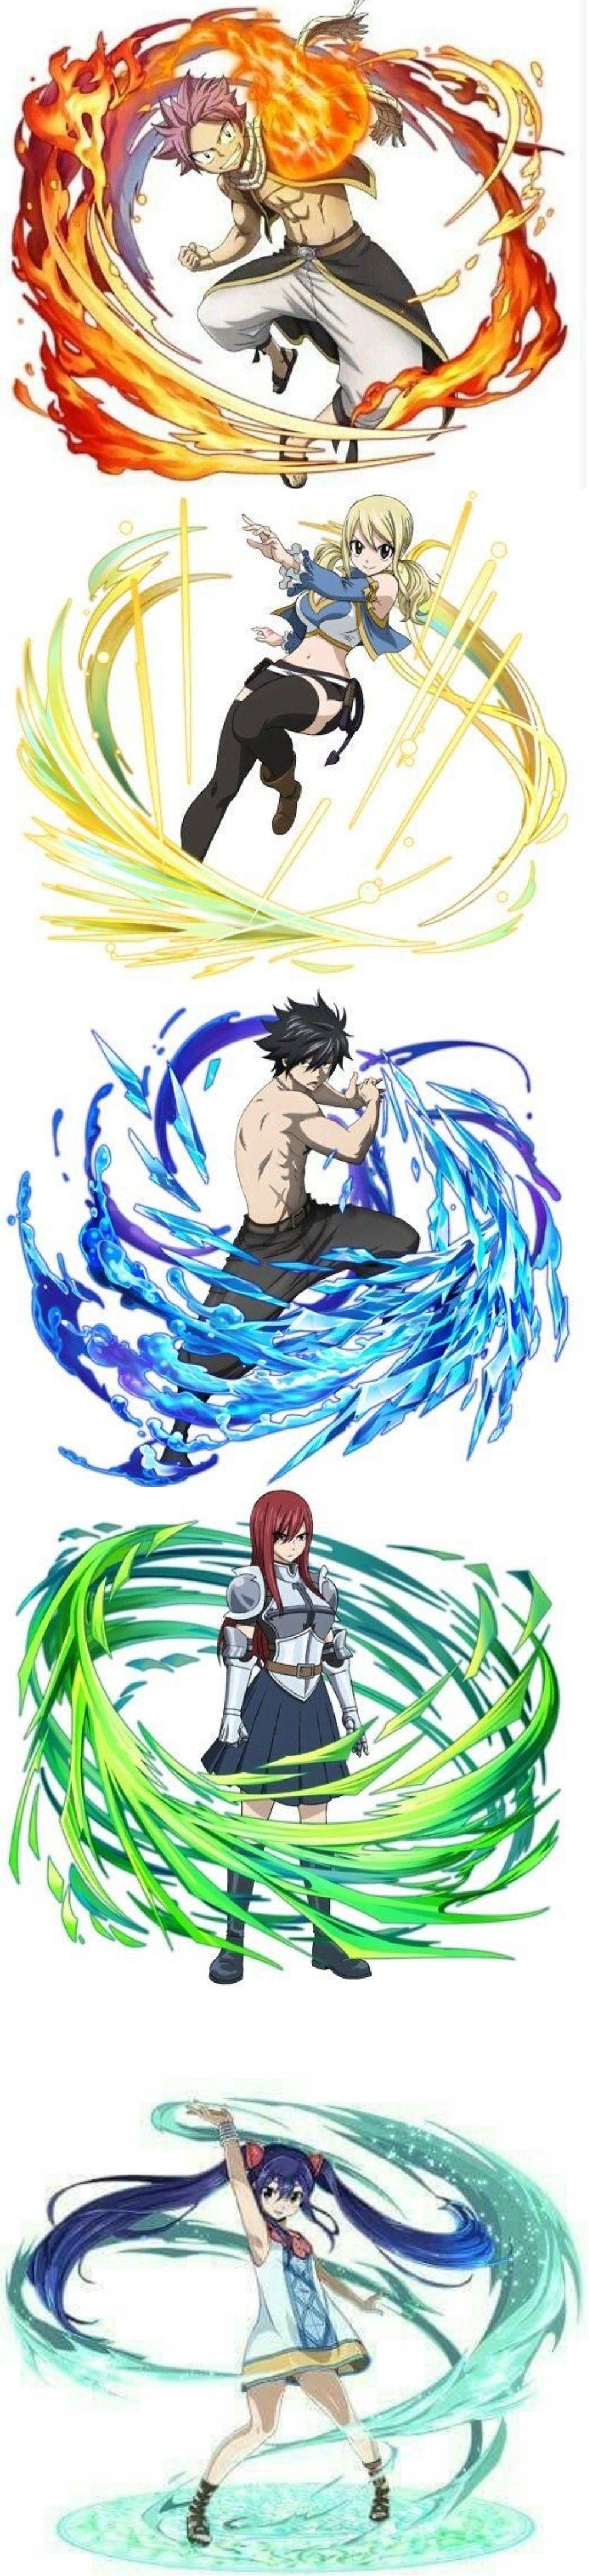 Team Natsu 024 | Fairy tail | Fairy tail, Fairy tail family